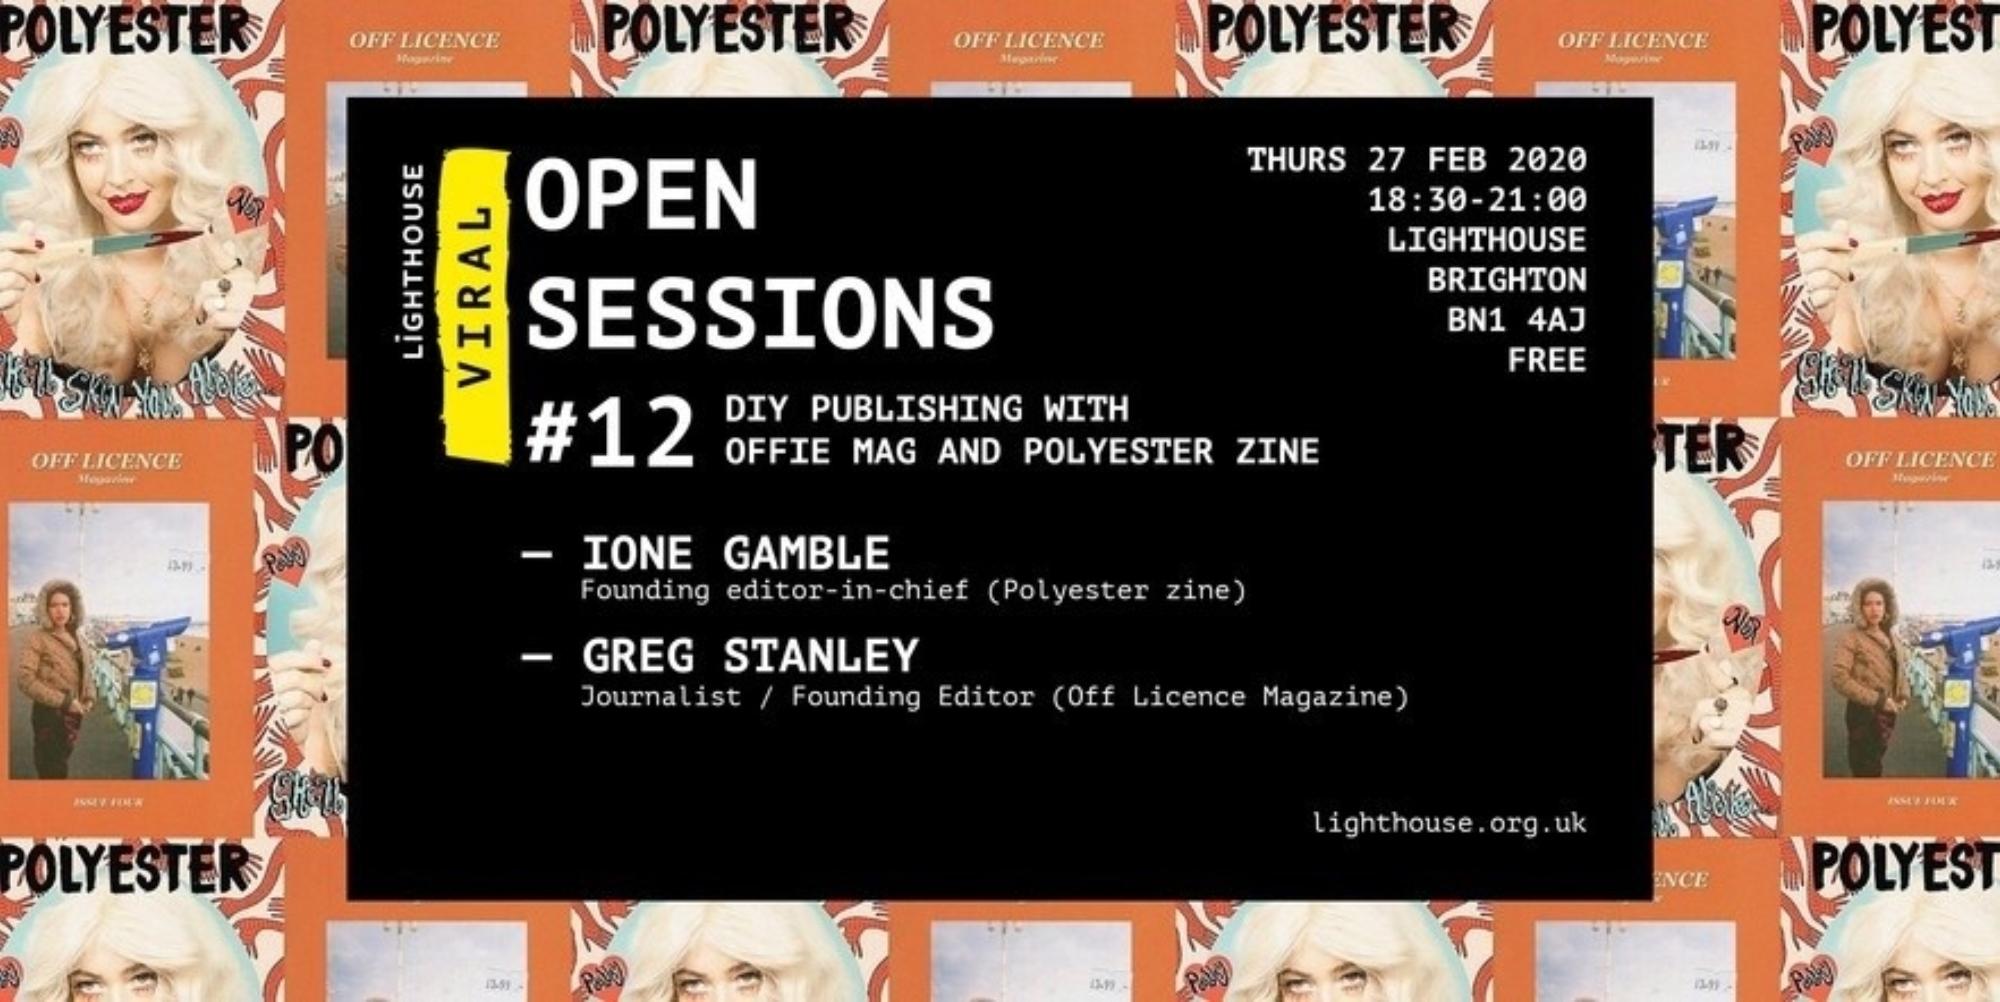 Open Session #12: DIY Publishing